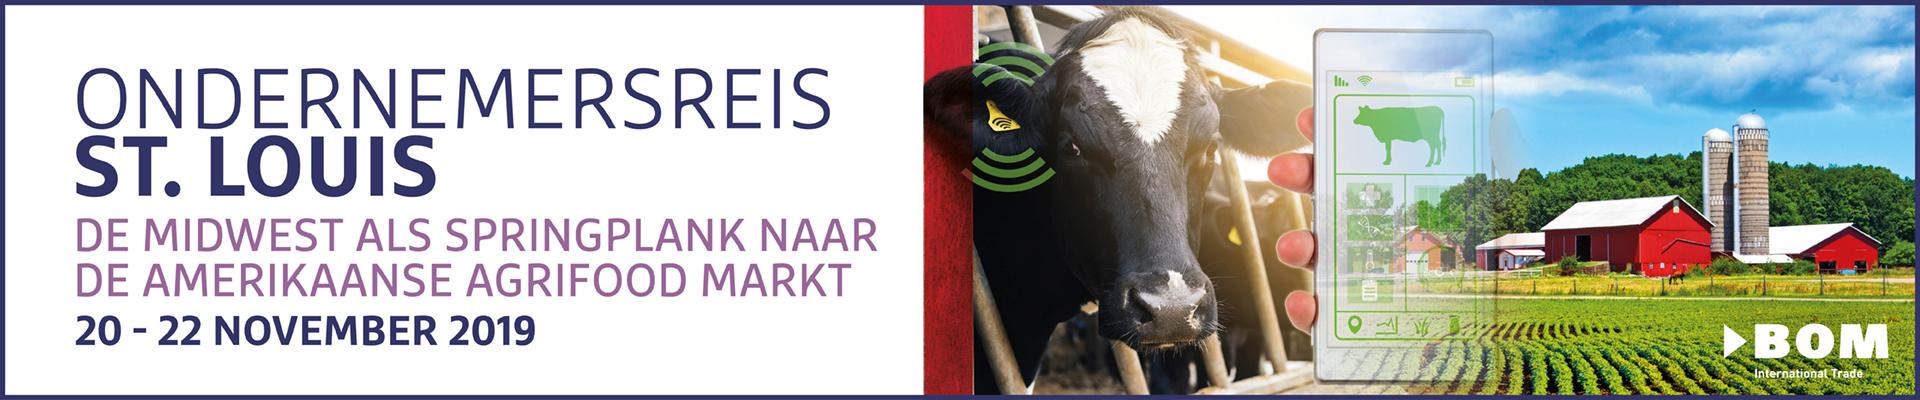 Ondernemersreis St. Louis 2019 - agrifood markt